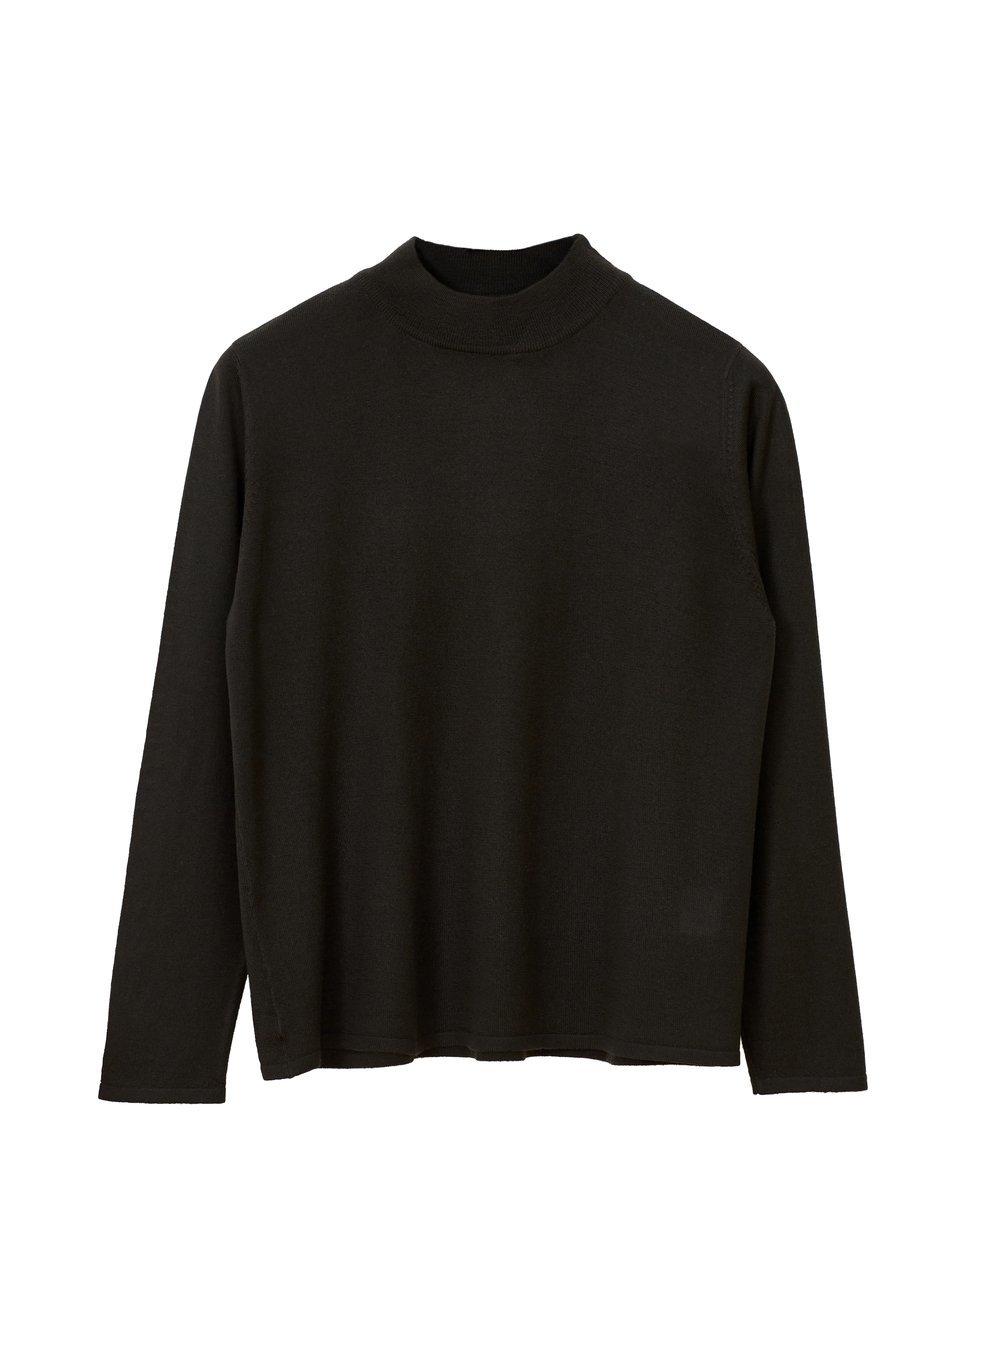 ARELA Joan Merino Wool Sweater In Dark Grey